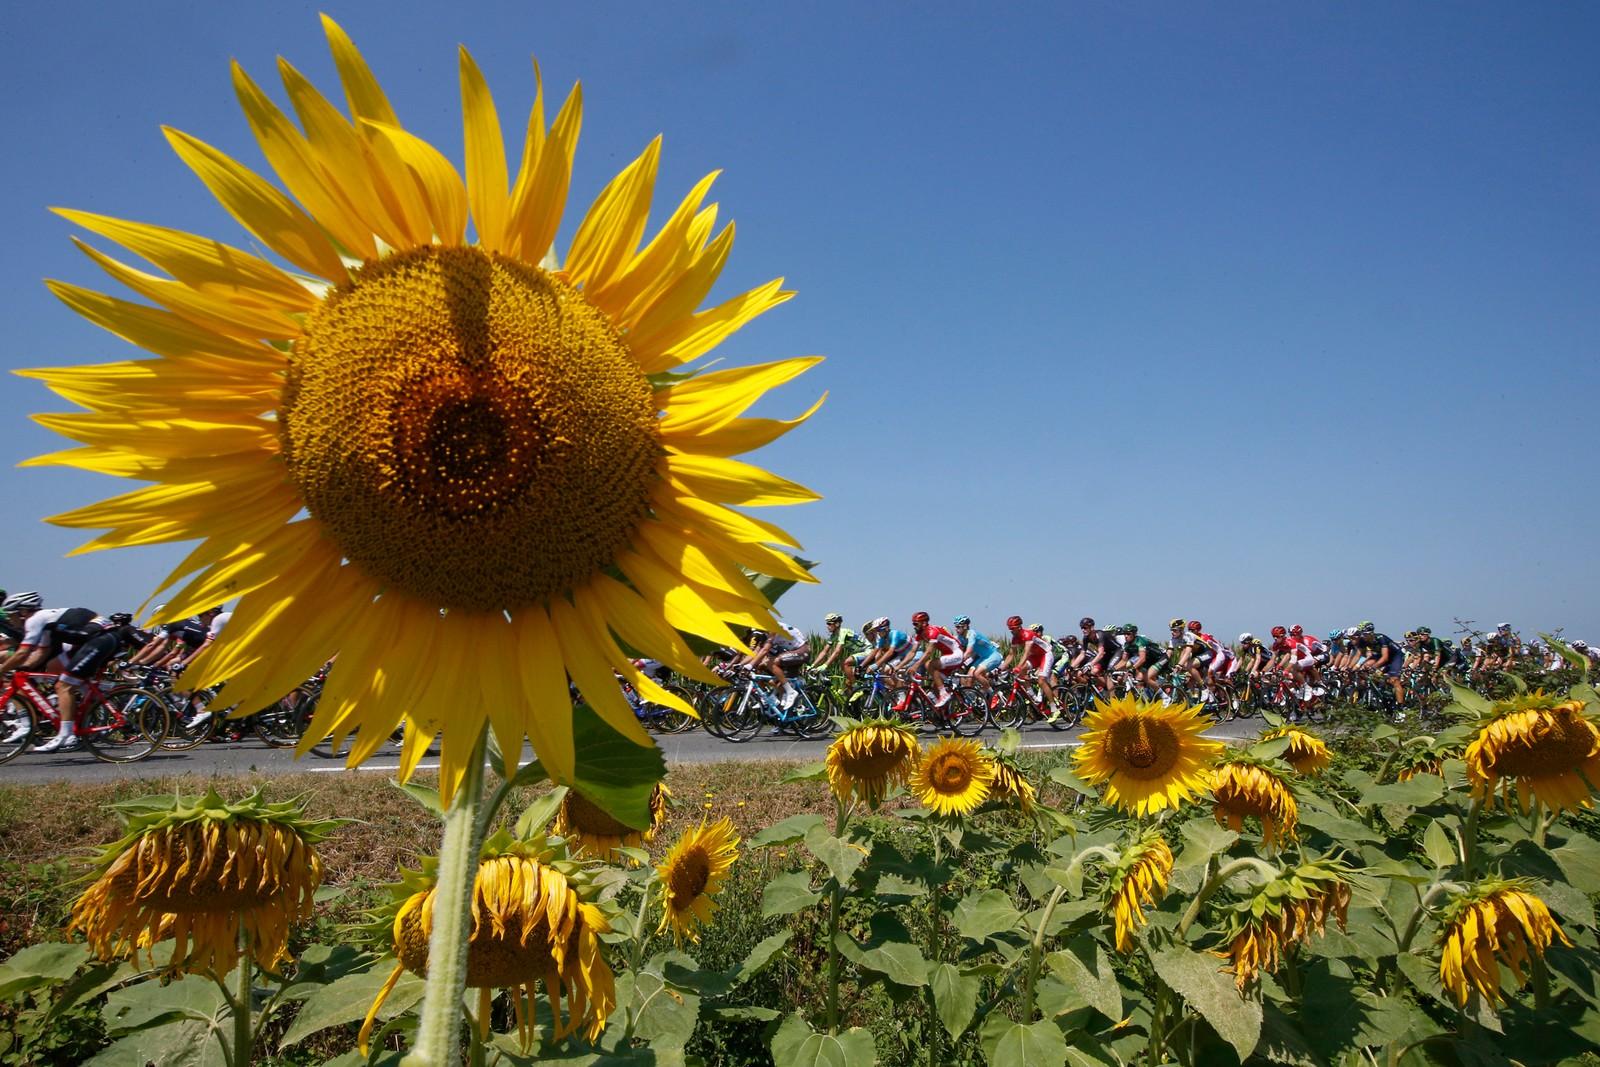 Obligatorisk solsikkebilde. REUTERS/Eric Gaillard